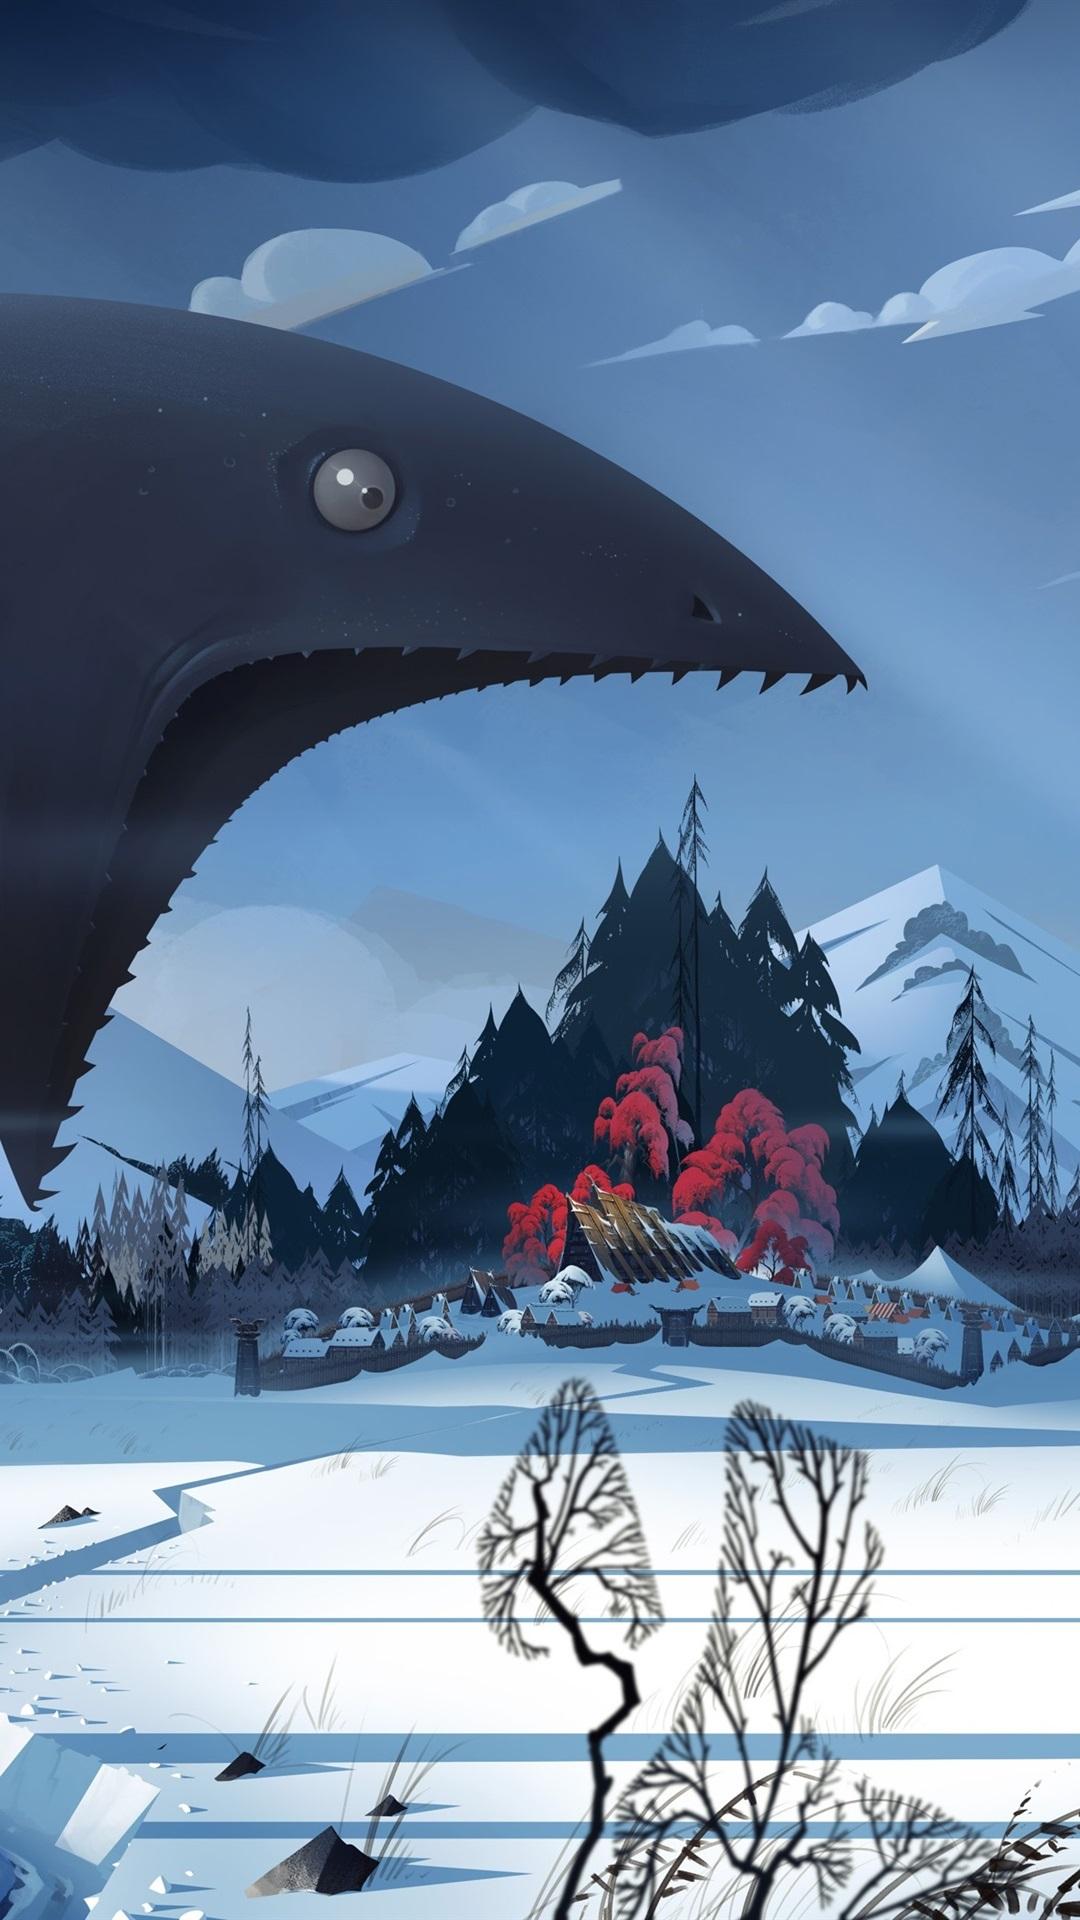 The Banner Saga Video Game Monster Winter Snow Village